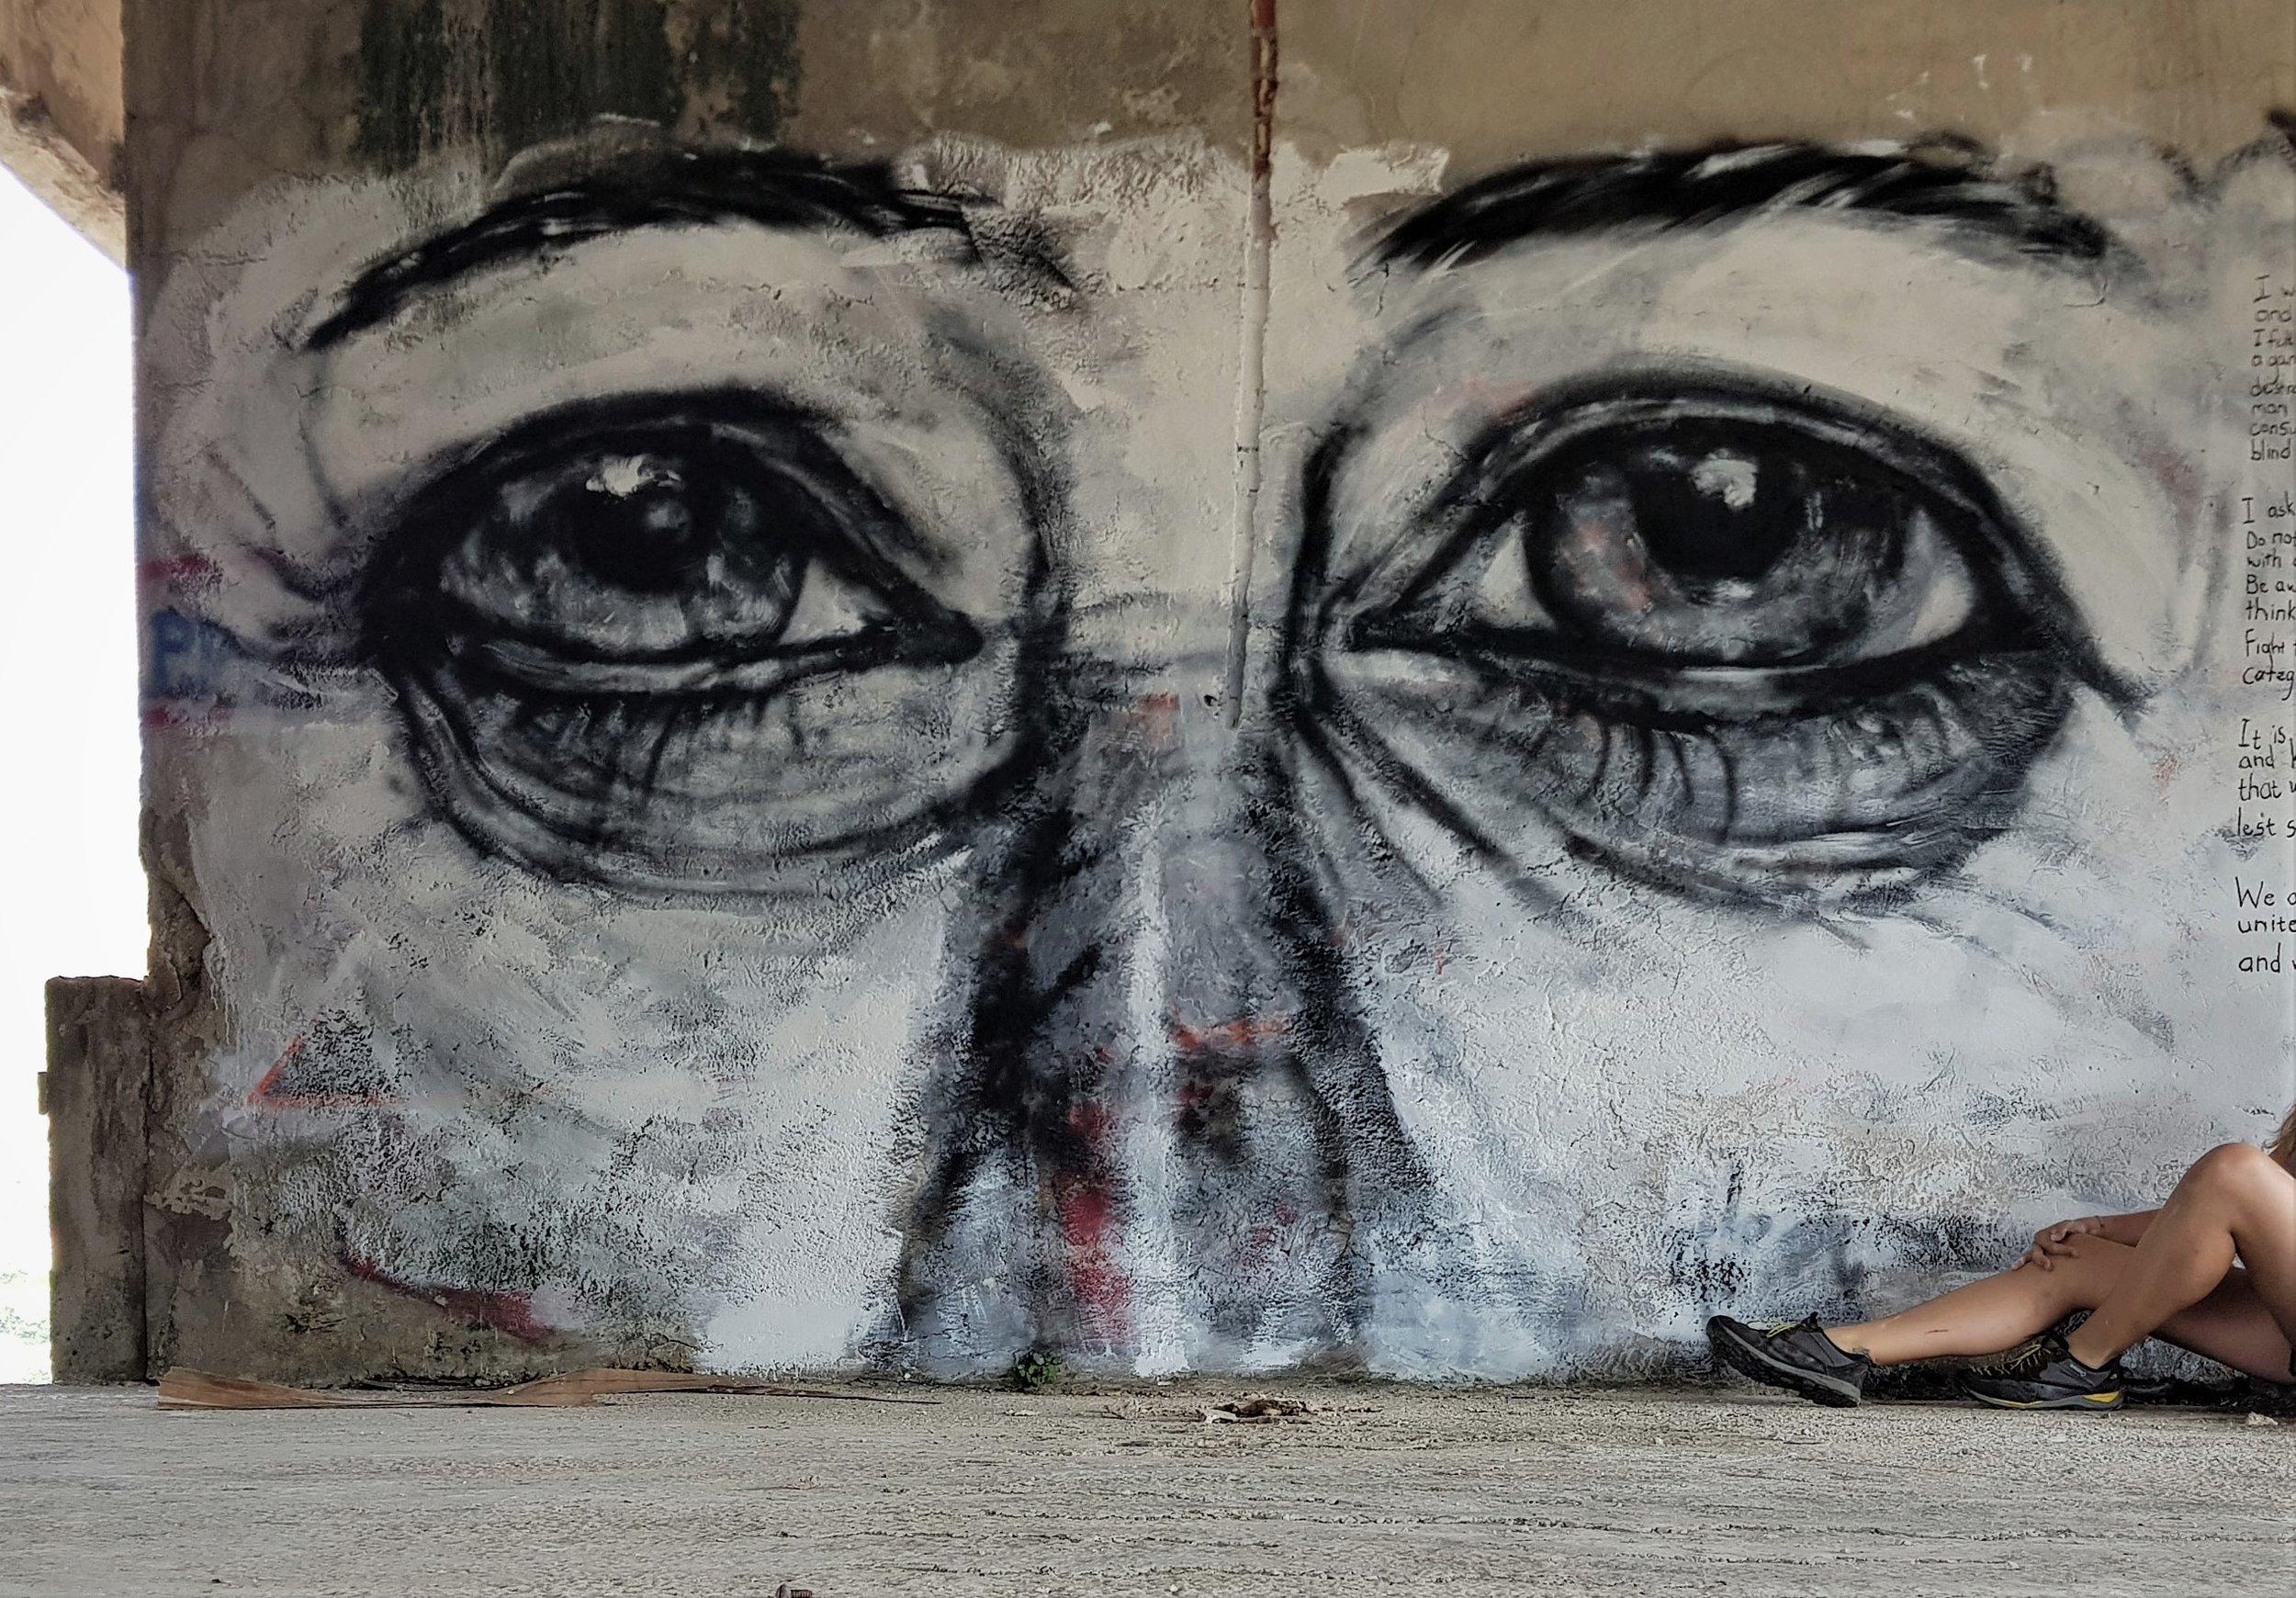 Alexandra Wuzyk Mostar Bosnia Face of War Victim.jpg